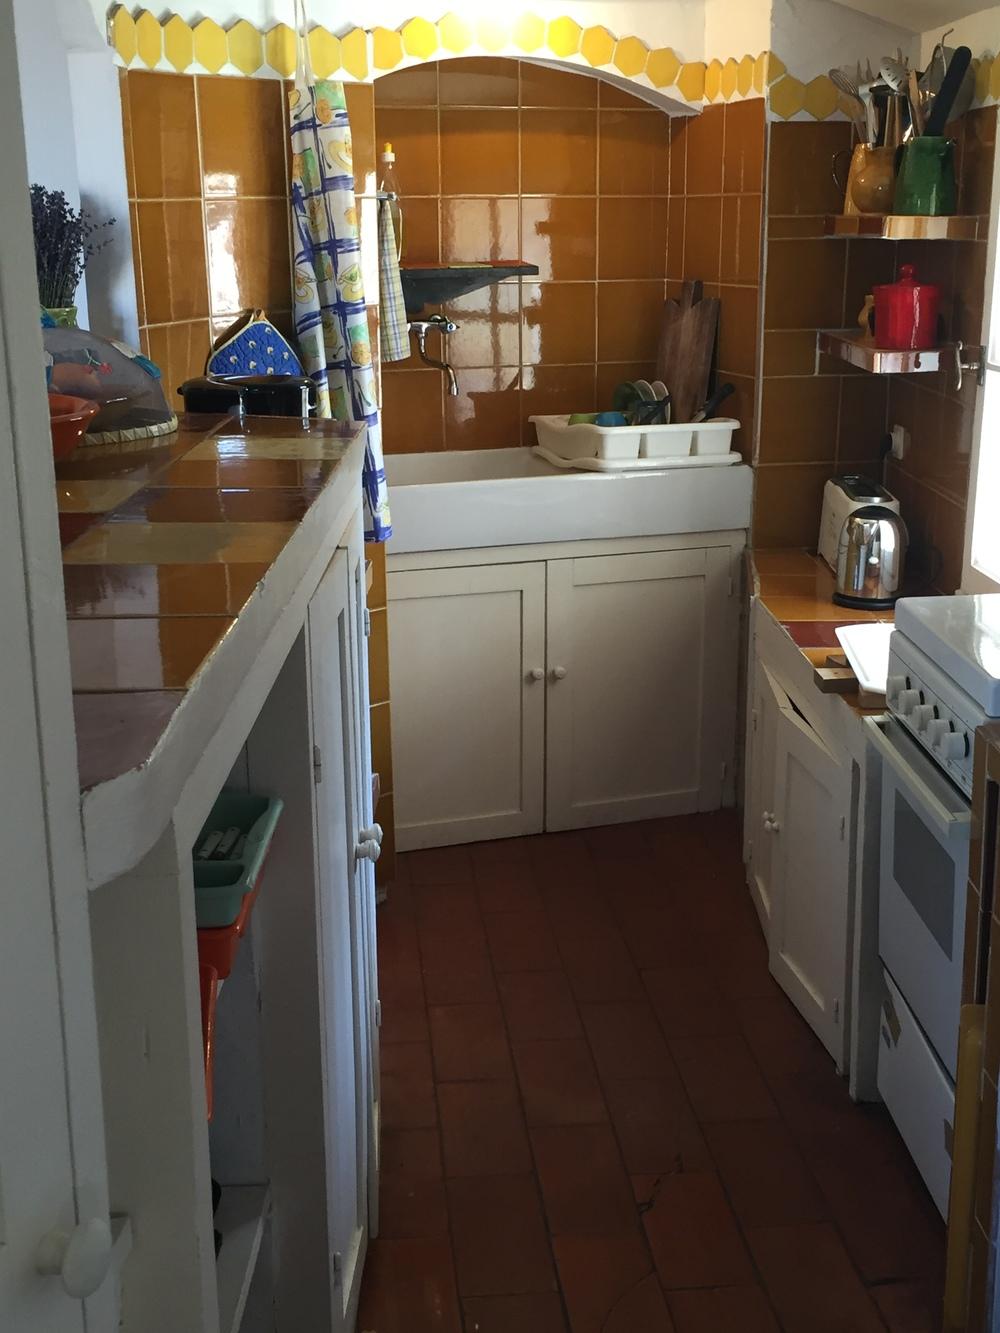 m kitchenjpg - M Kitchen